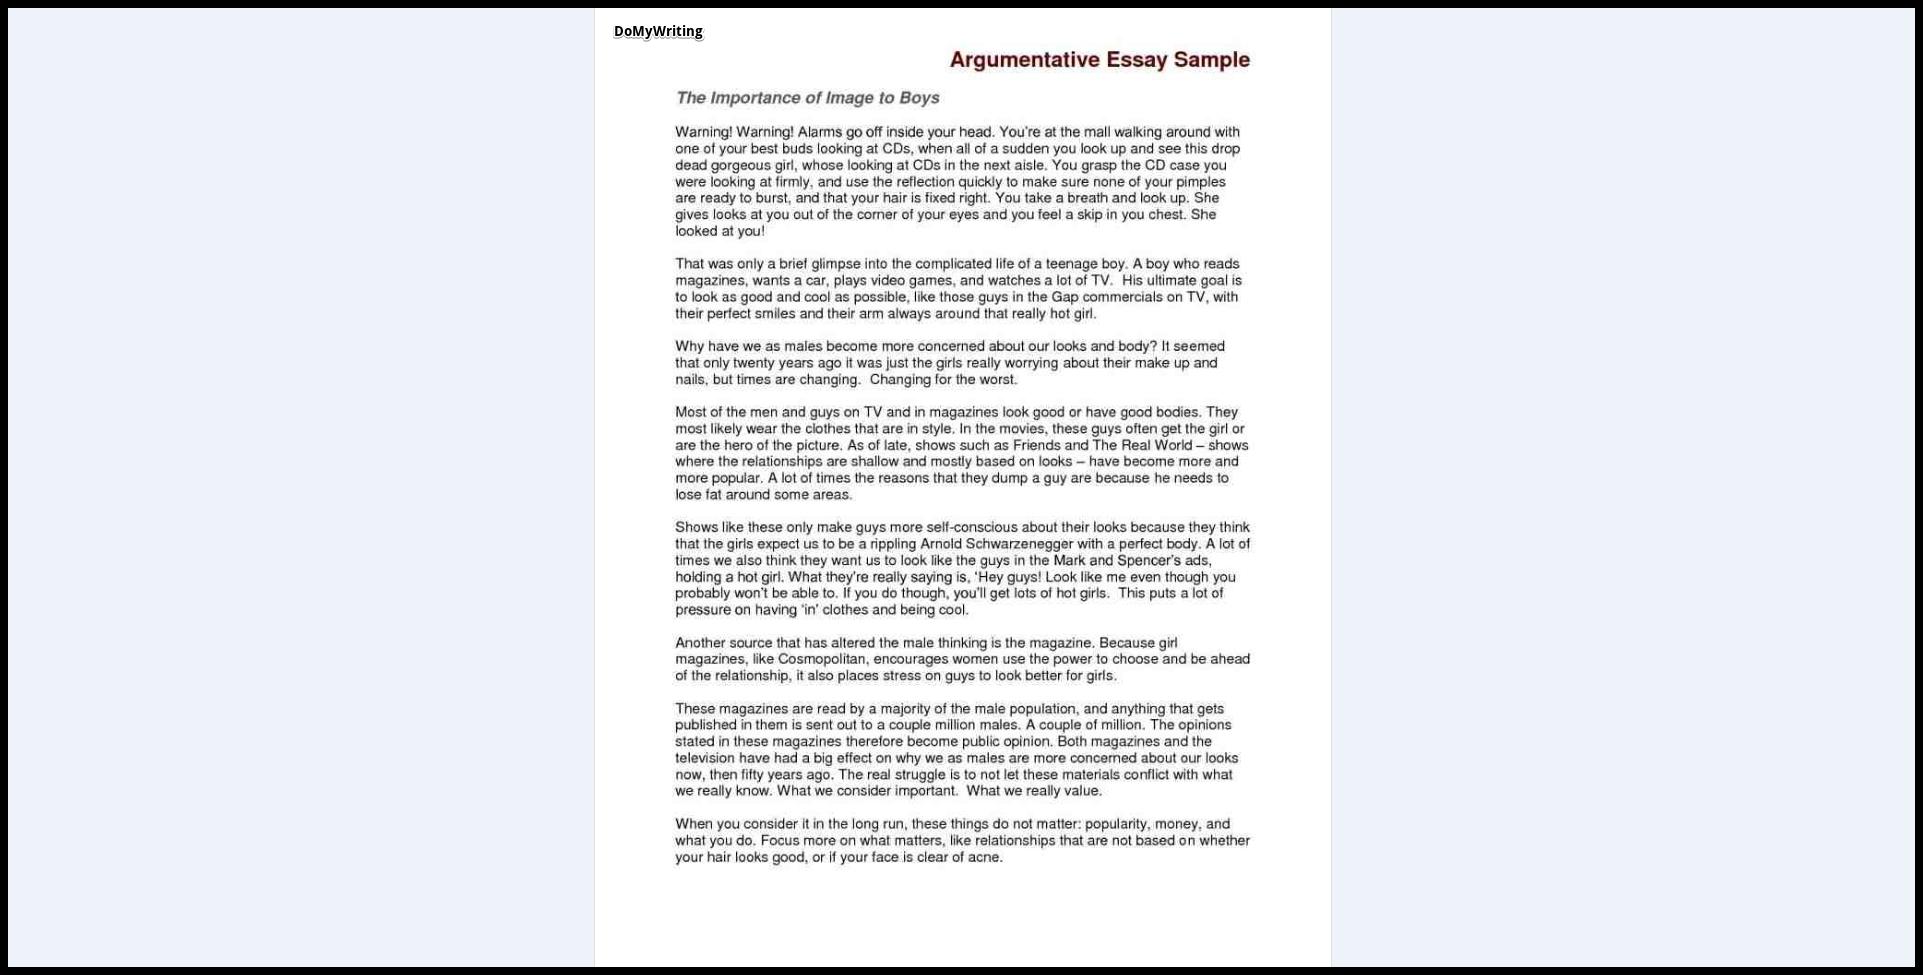 005 Argumentative Essay Sample Good Topics For Discursive Wonderful A Interesting Higher Persuasive Full